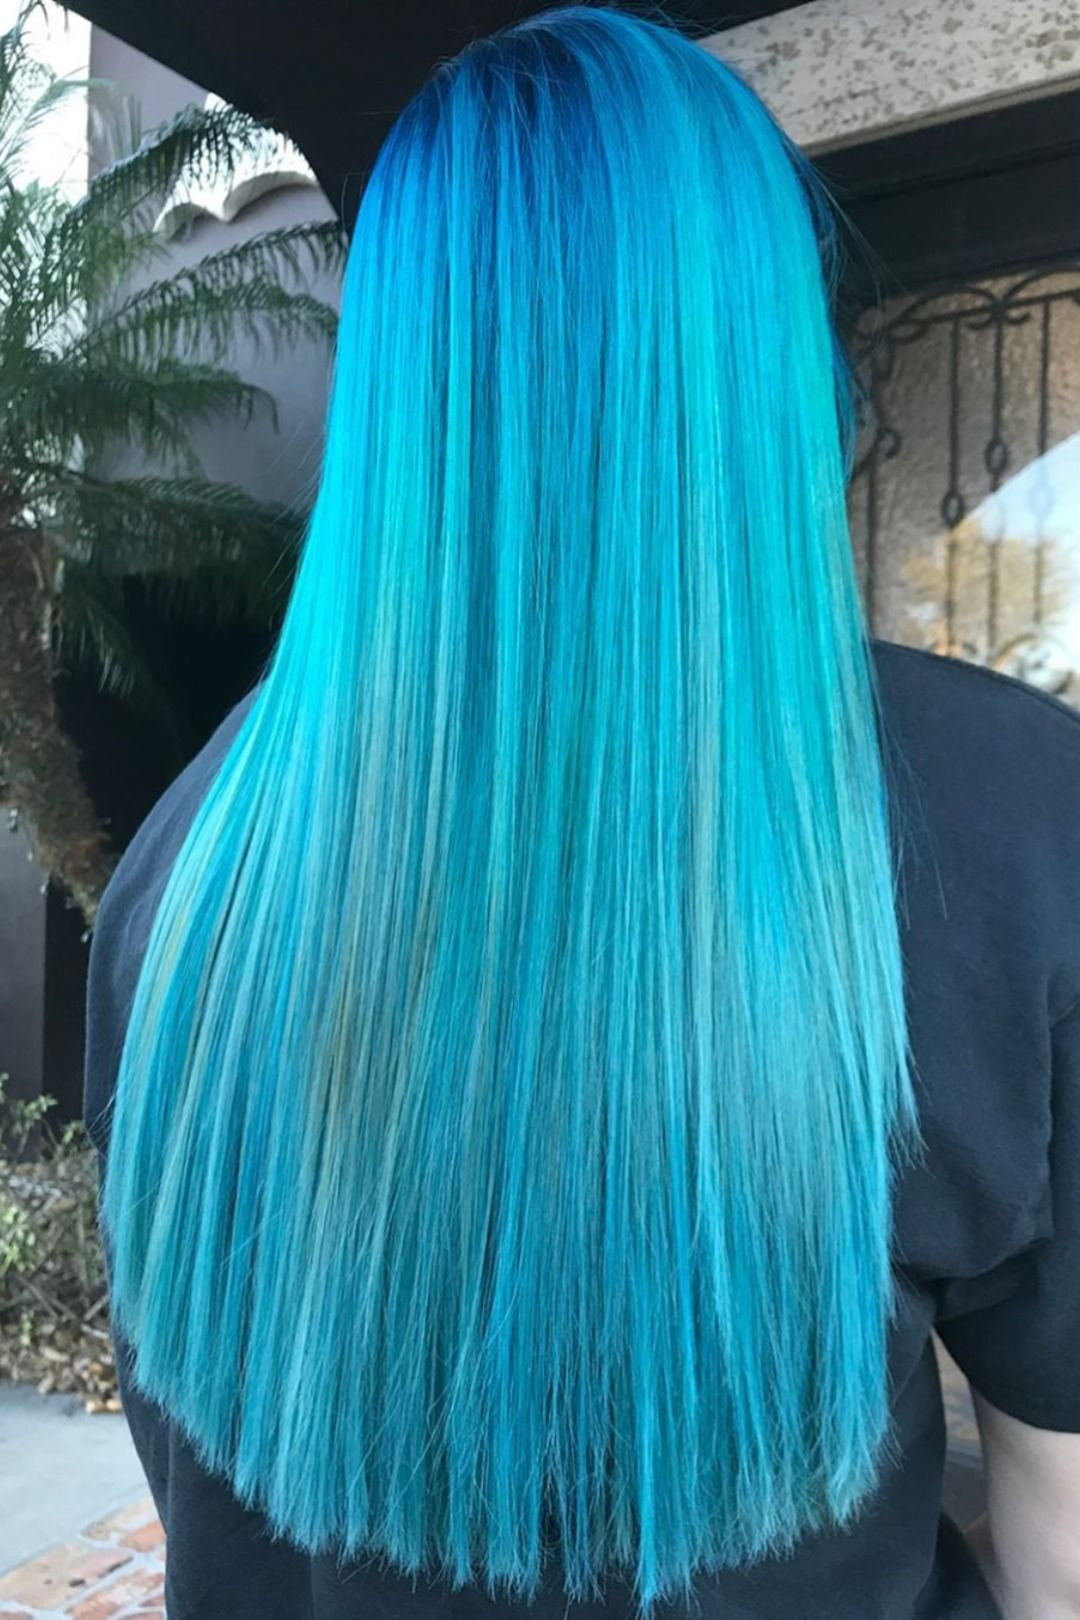 Lexigonzalez20 Bright Blue Hair Light Blue Hair Dye Dyed Hair Blue